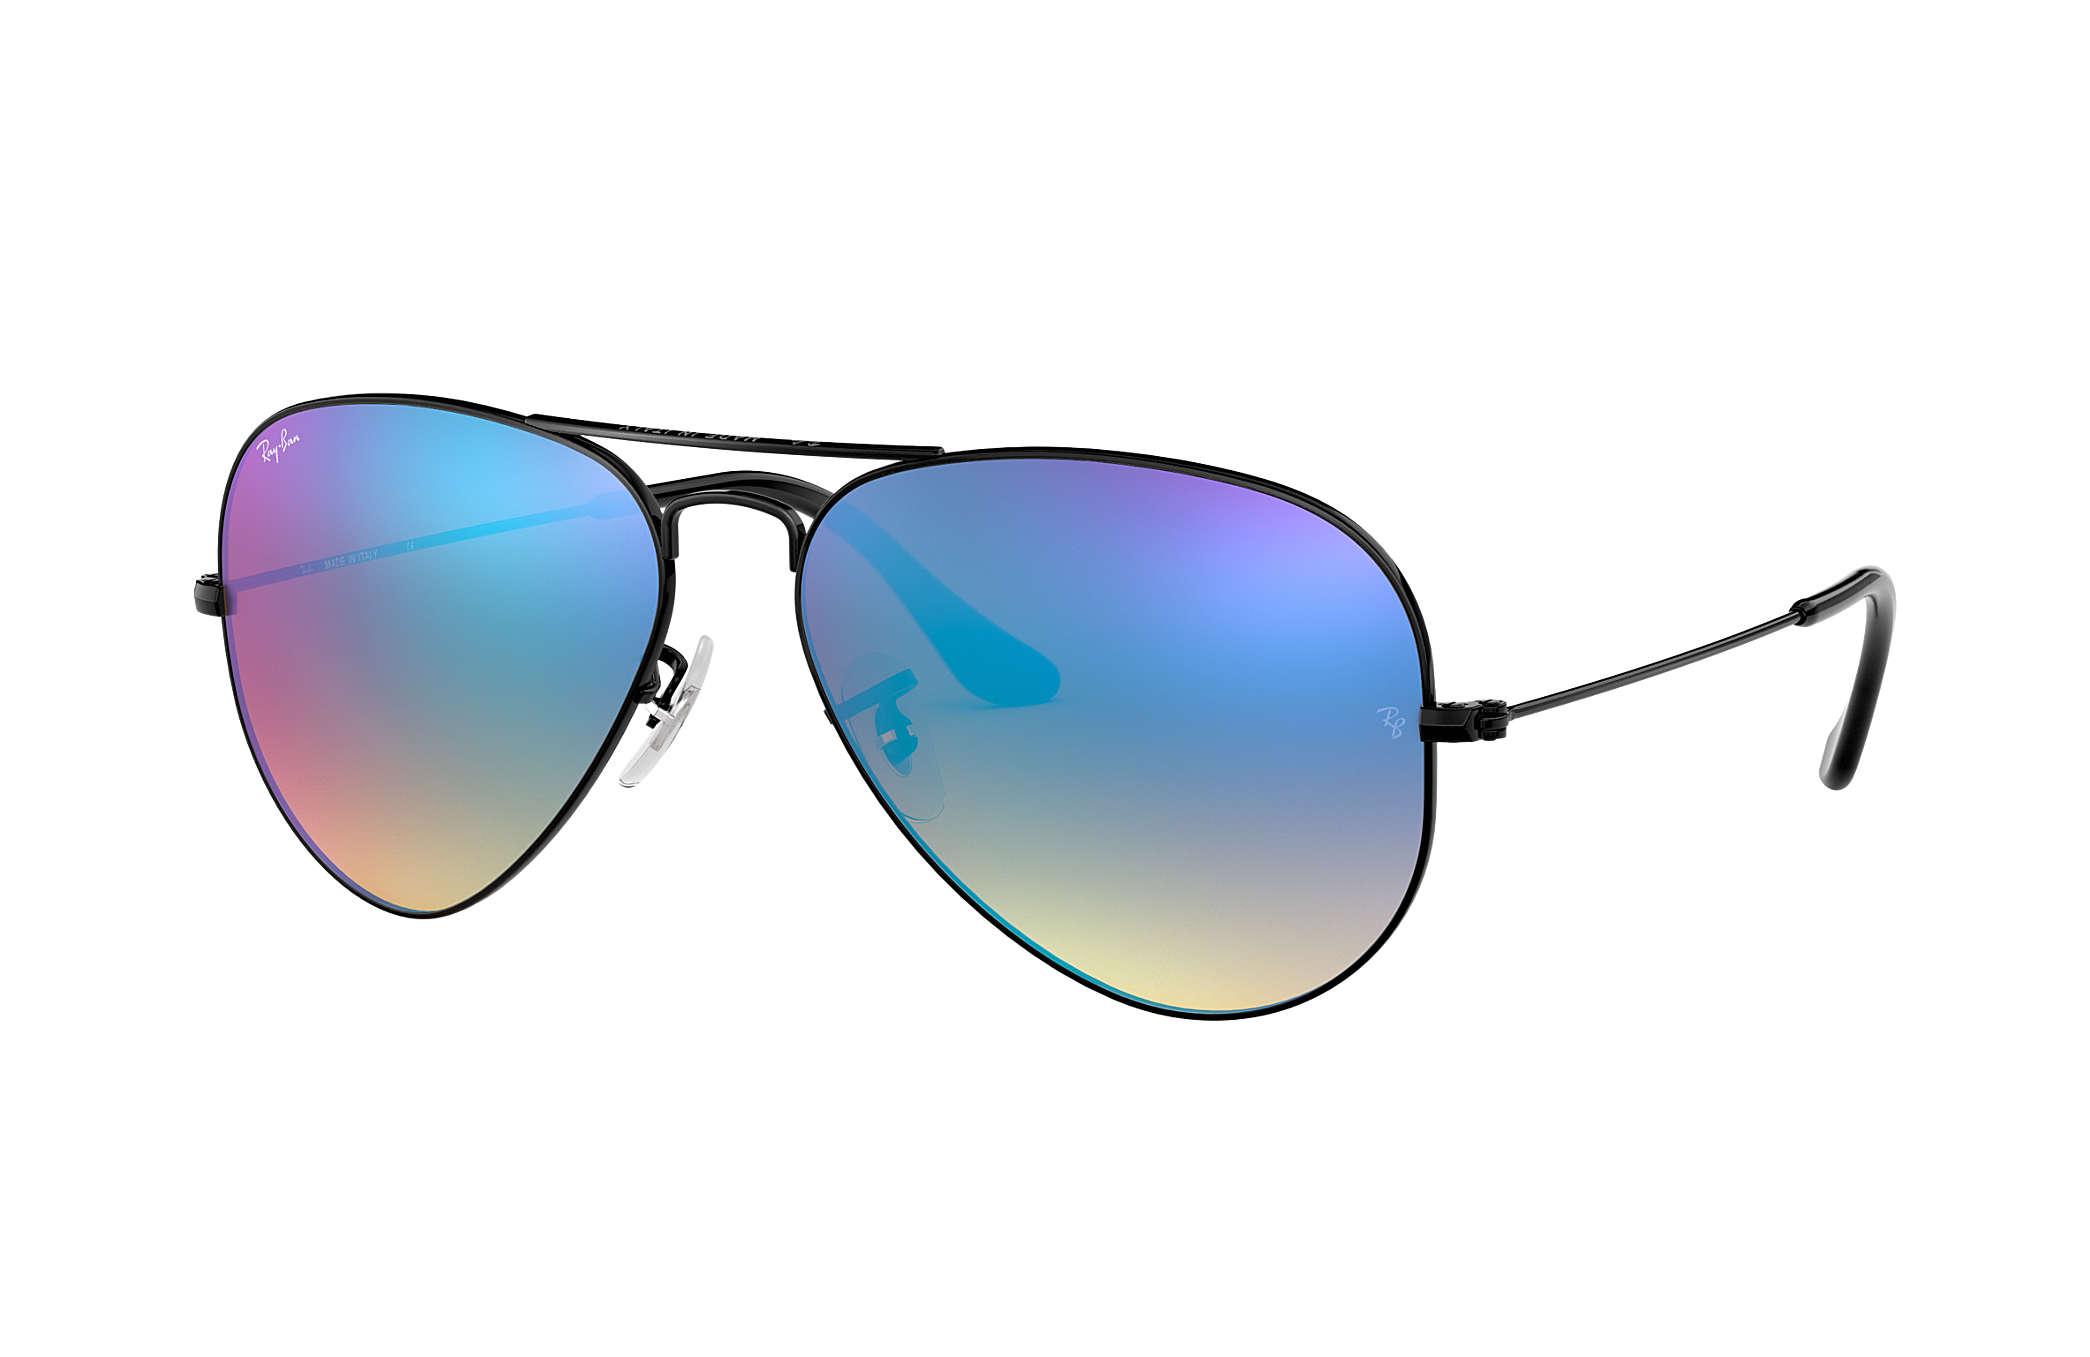 Ray ban sunglasses gradient - Ray Ban 0rb3025 Aviator Flash Lenses Gradient Black Sun